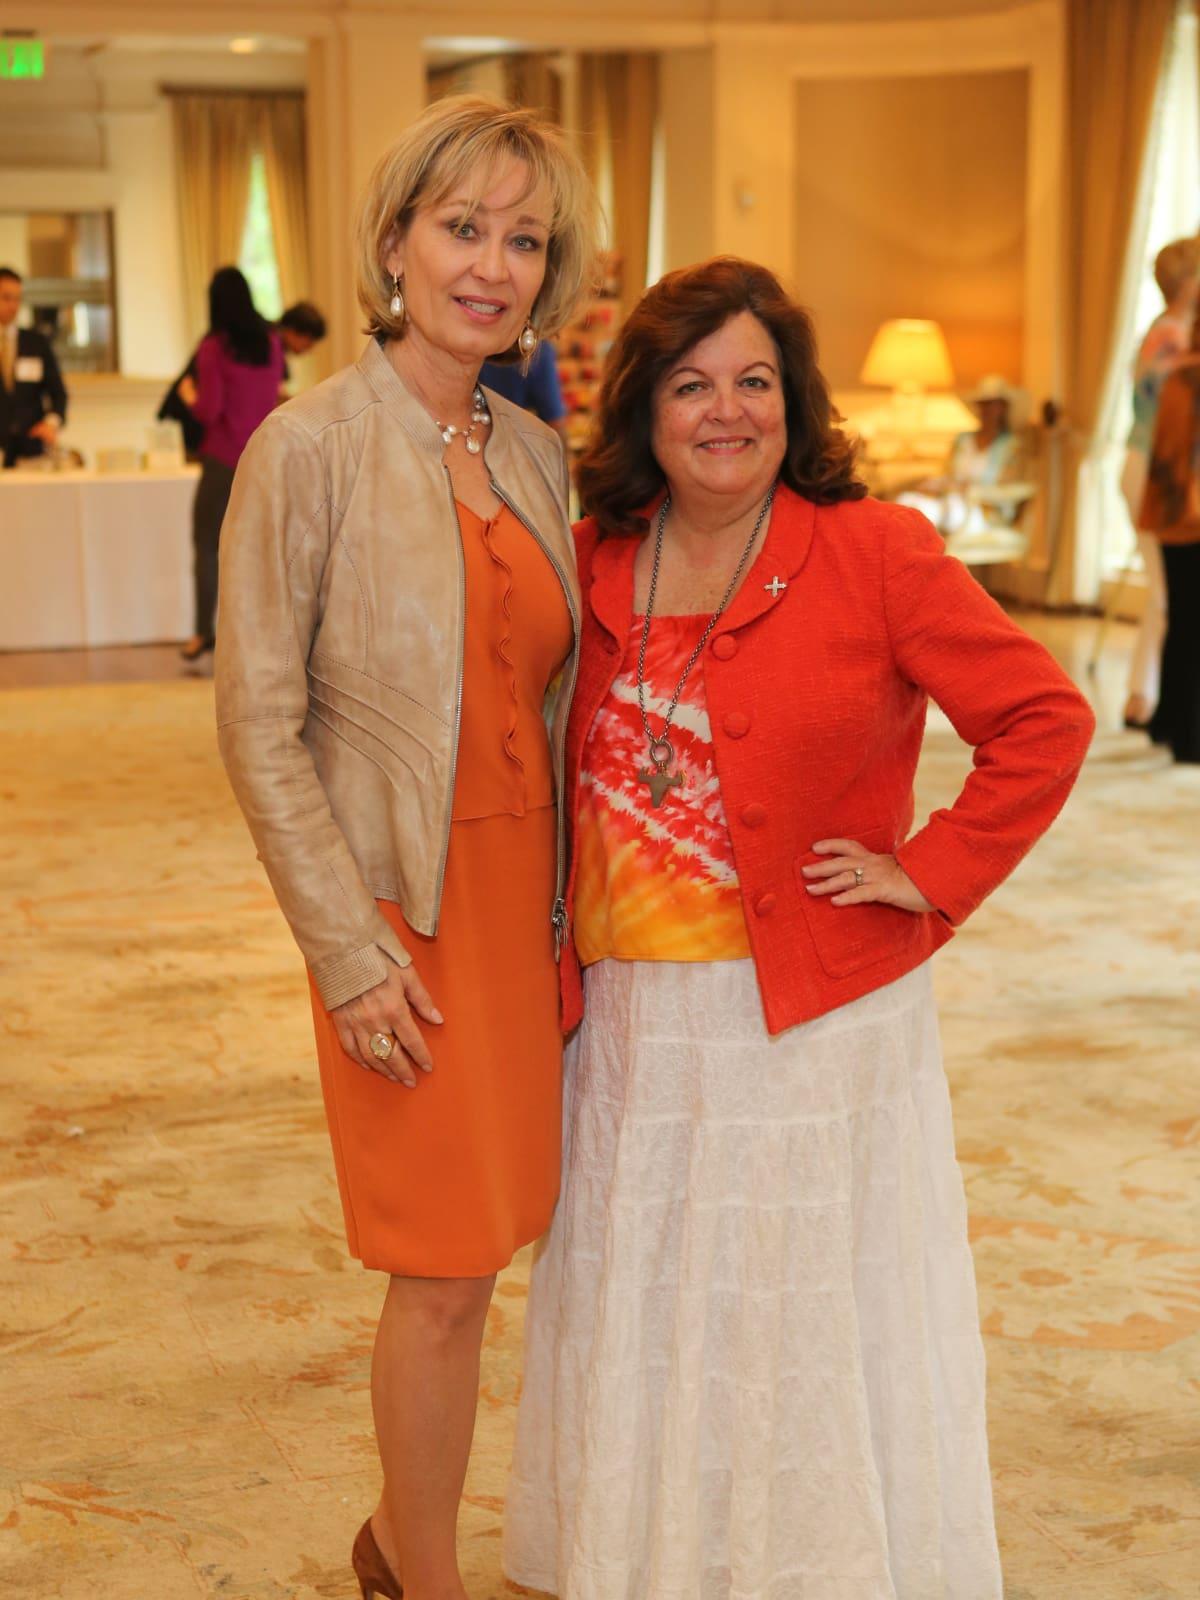 Partners Luncheon 4/16, Cathy Borlenghi, Carolyn Moody Drake